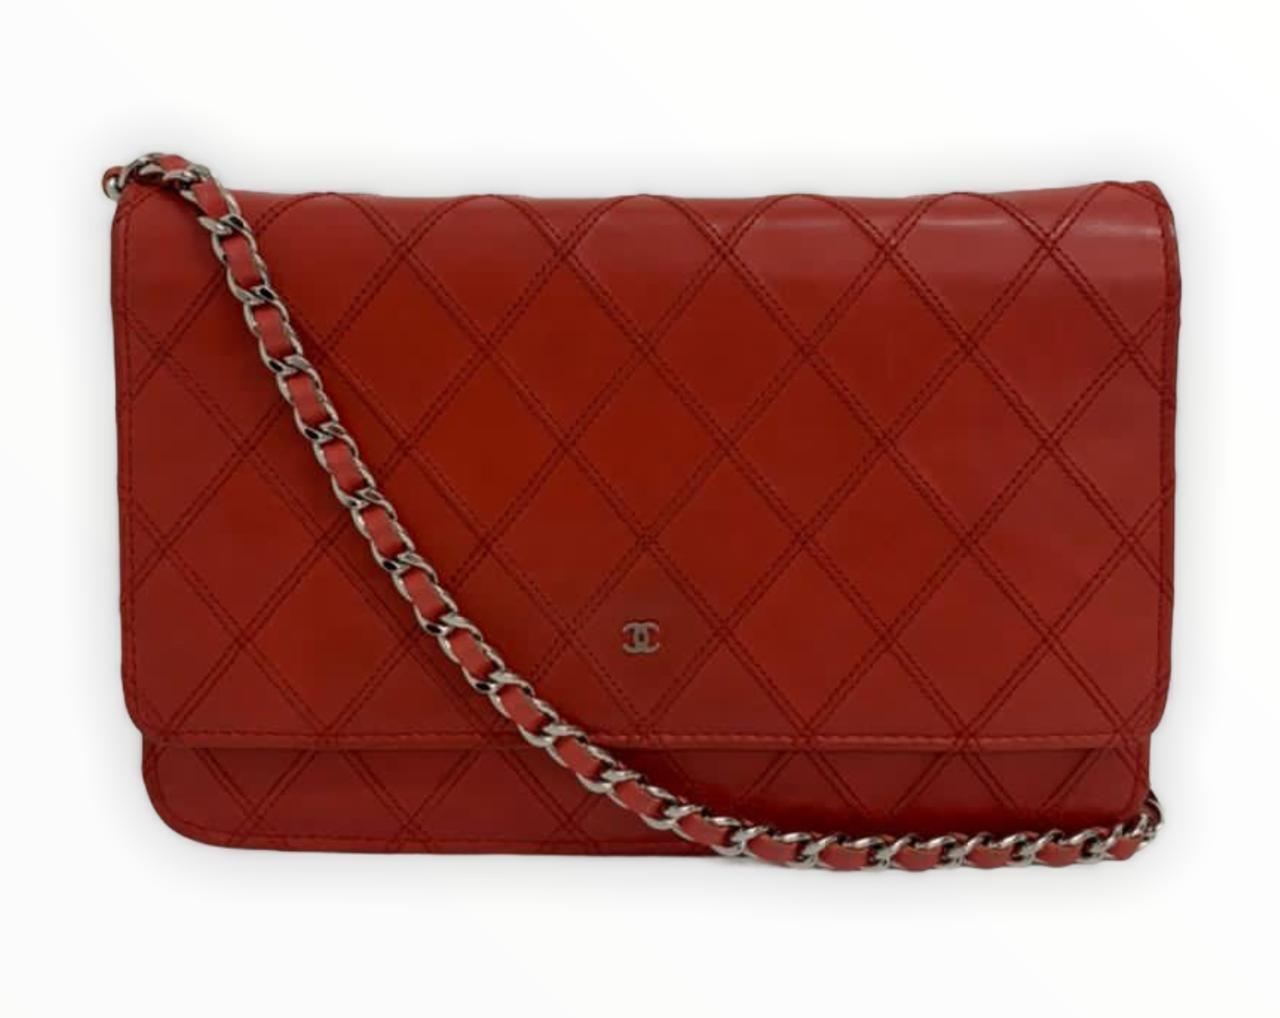 Bolsa Chanel Wallet On Chain Vermelha